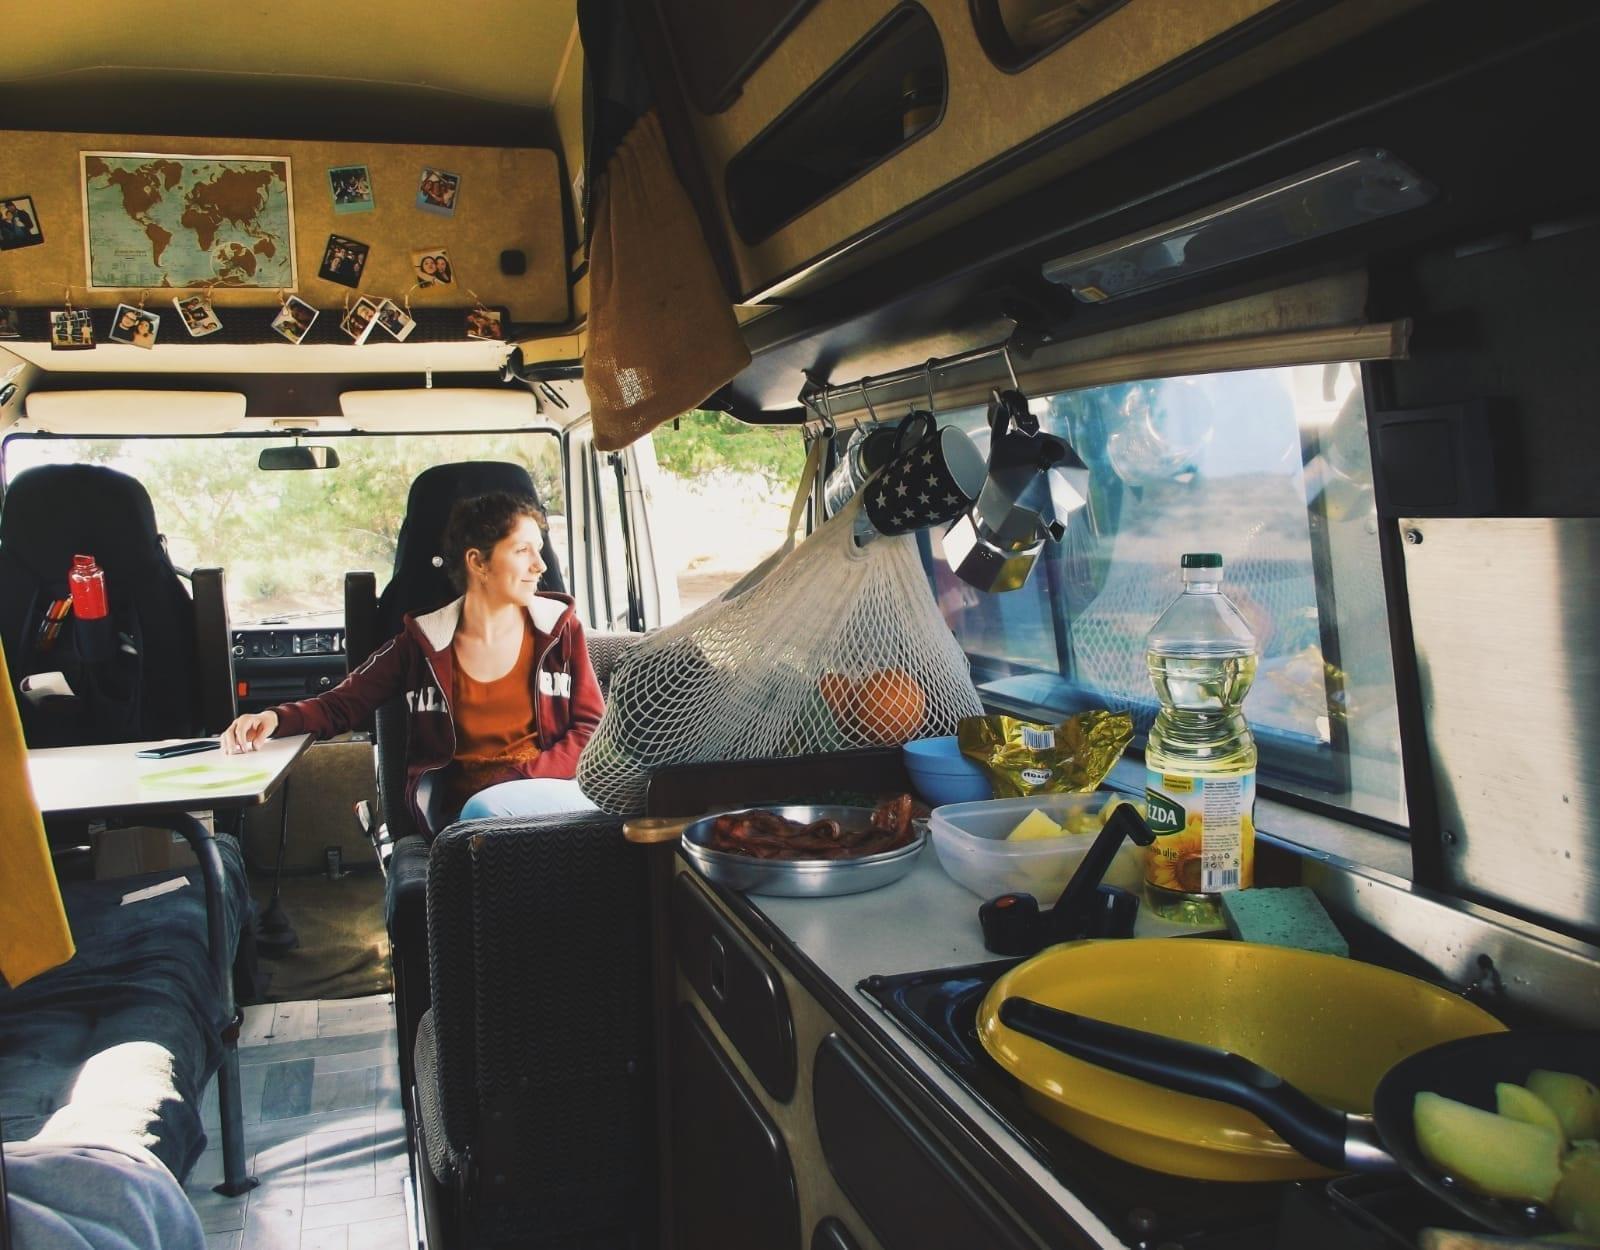 van-amenage-camping-car-oldschool-roadtrip-europe-vanlife-mercedes-207-d-james-cook-westfalia